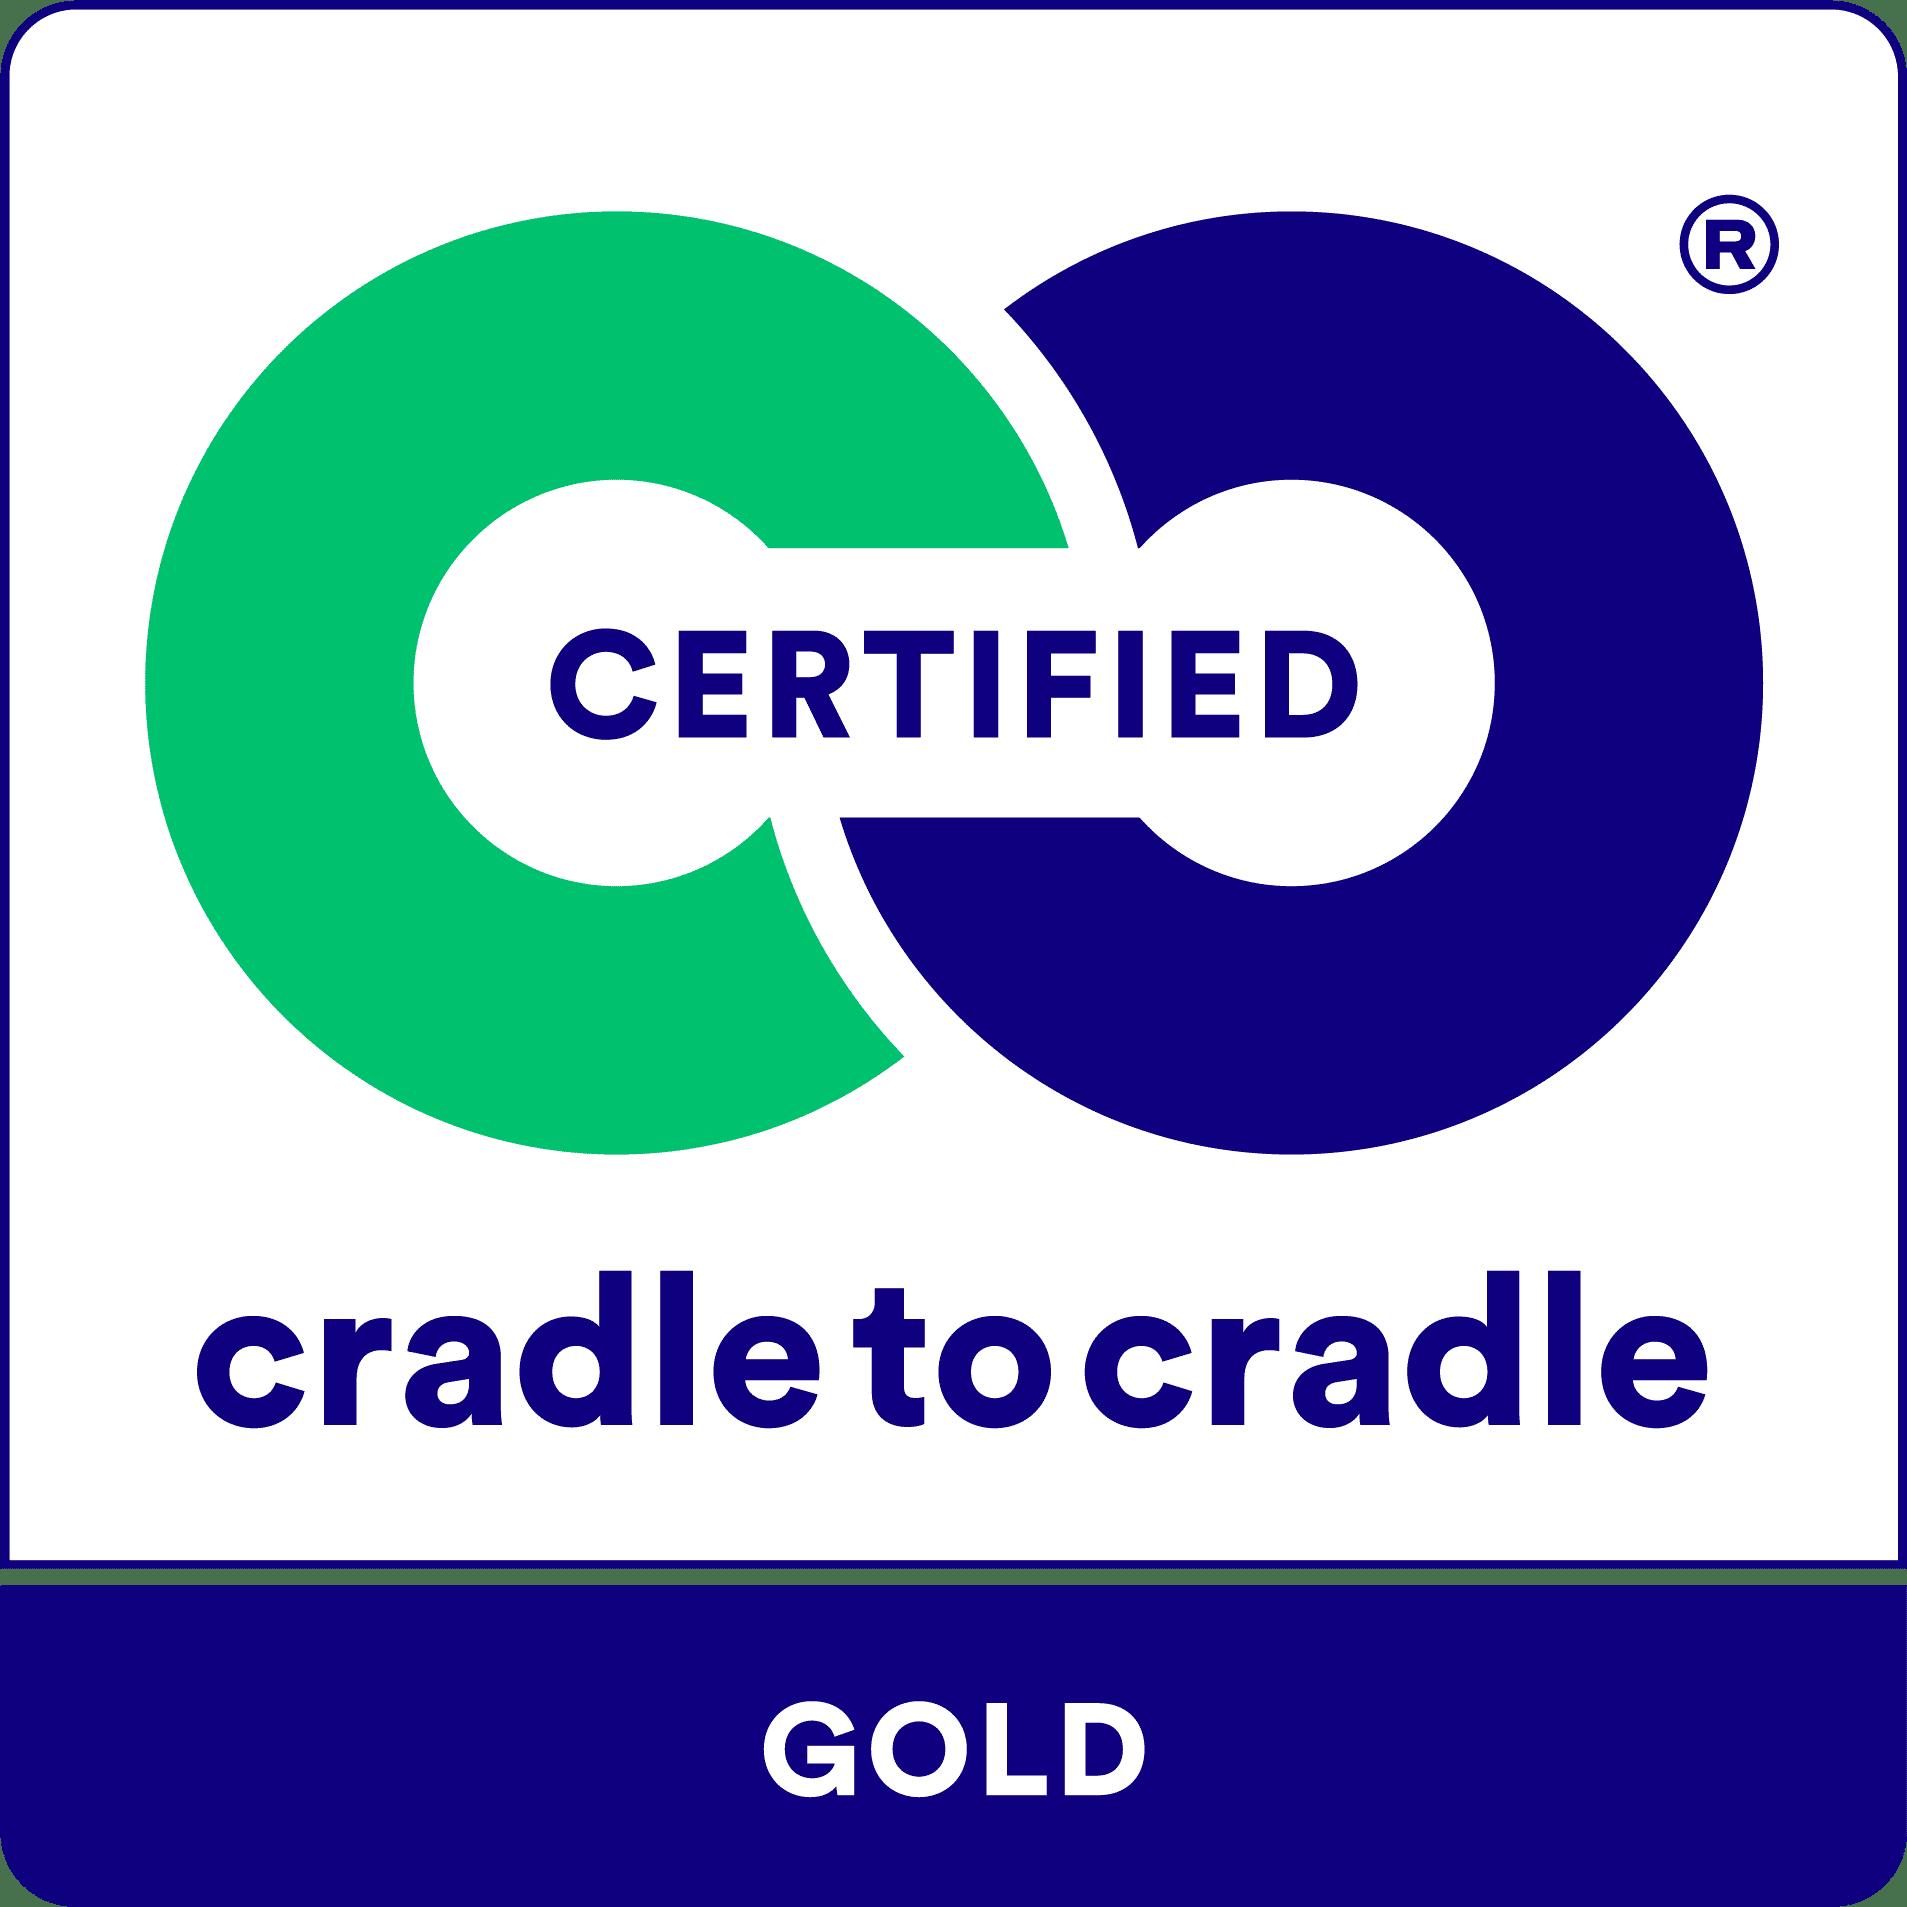 cradle to cradle certified logo